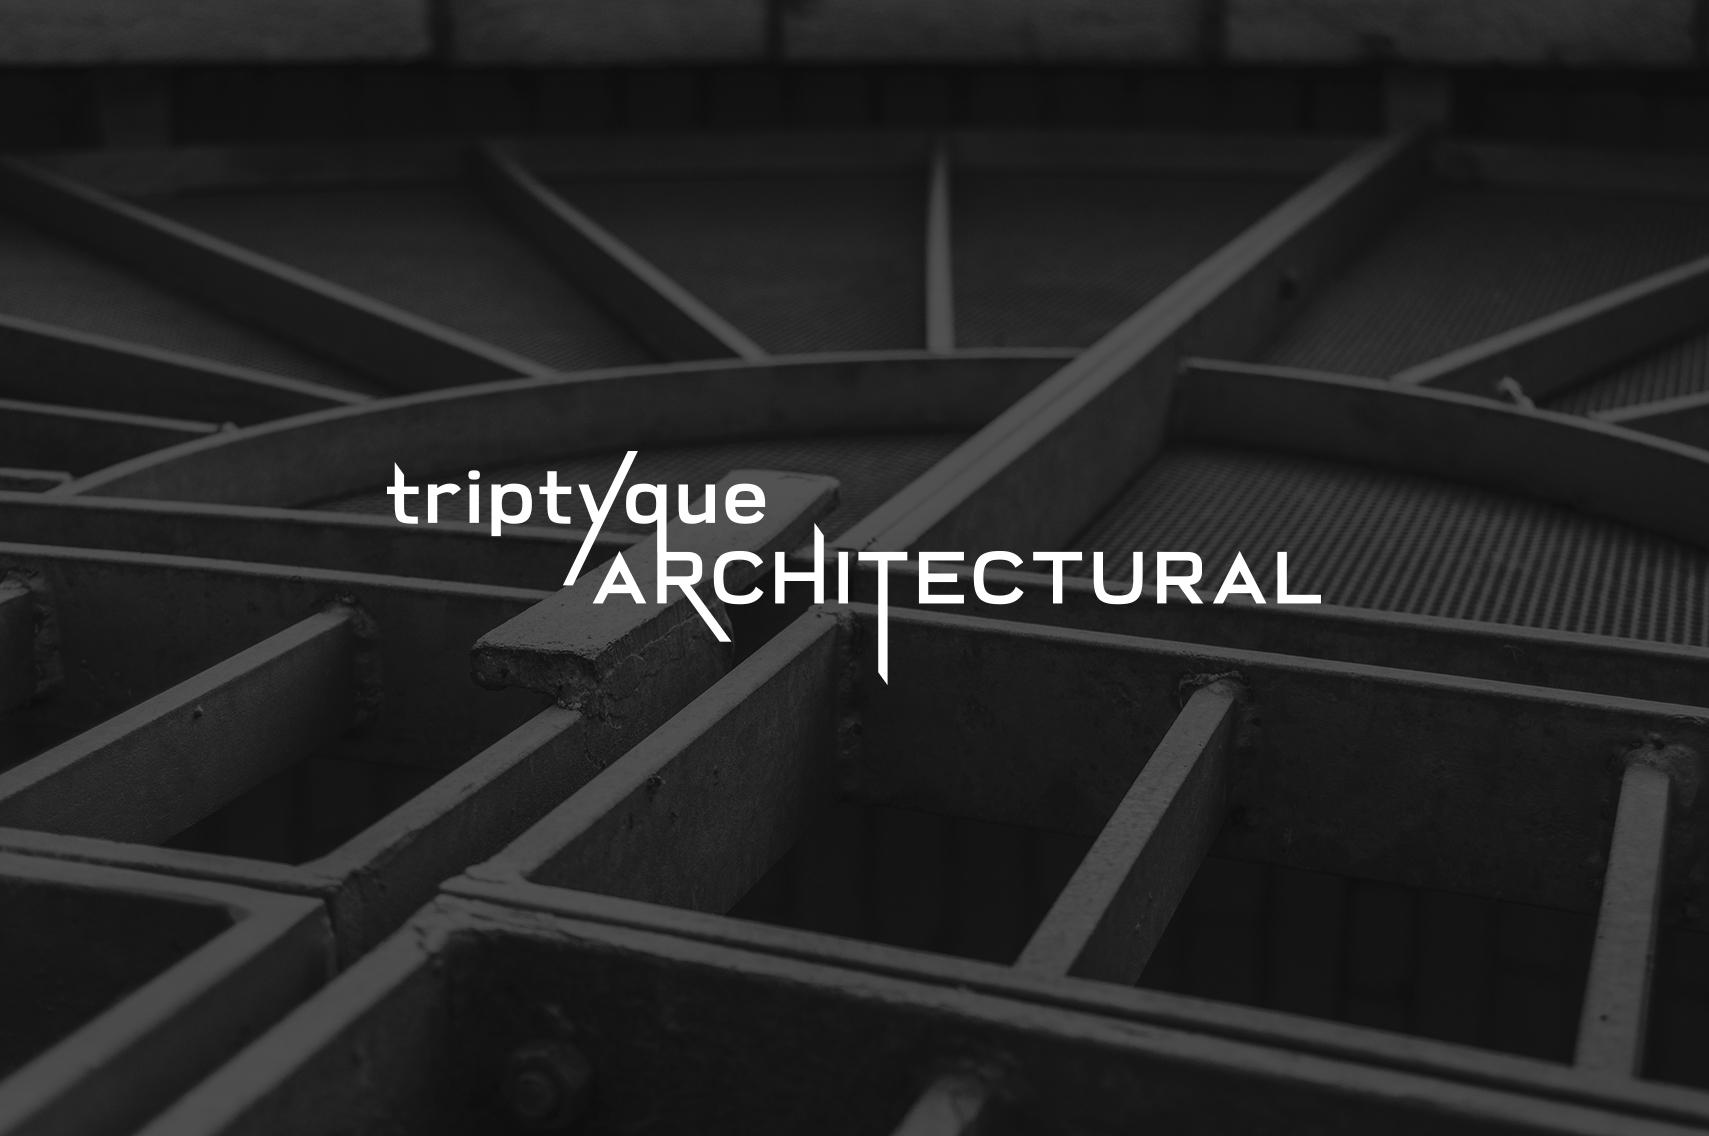 TRIPTYQUE ARCHITECTURAL